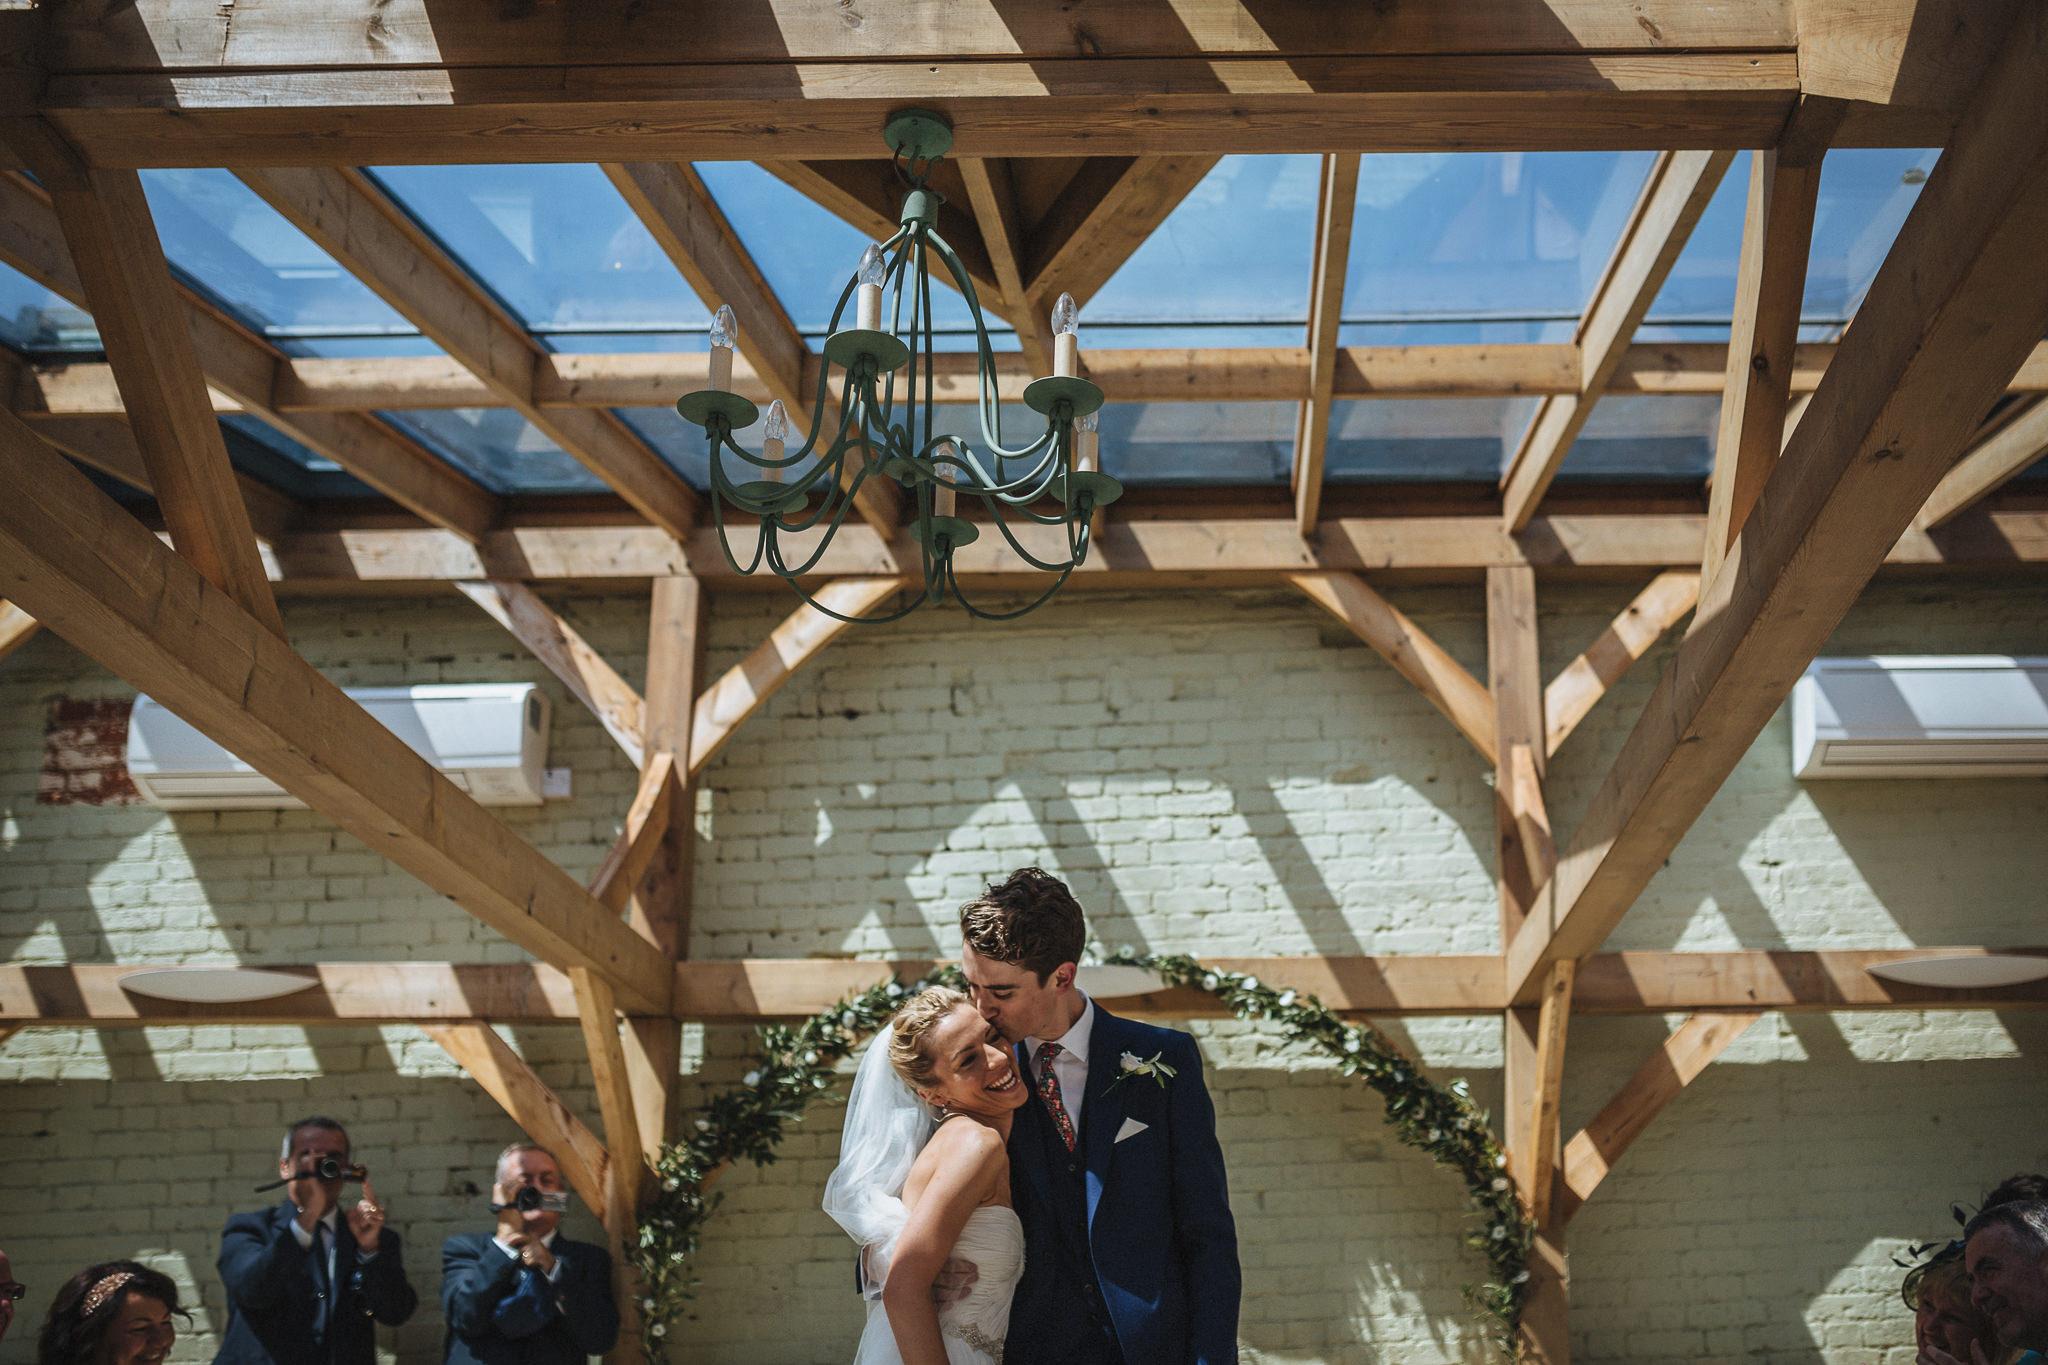 paul-marbrook-Gaynes-Park Wedding-Photographer-90054